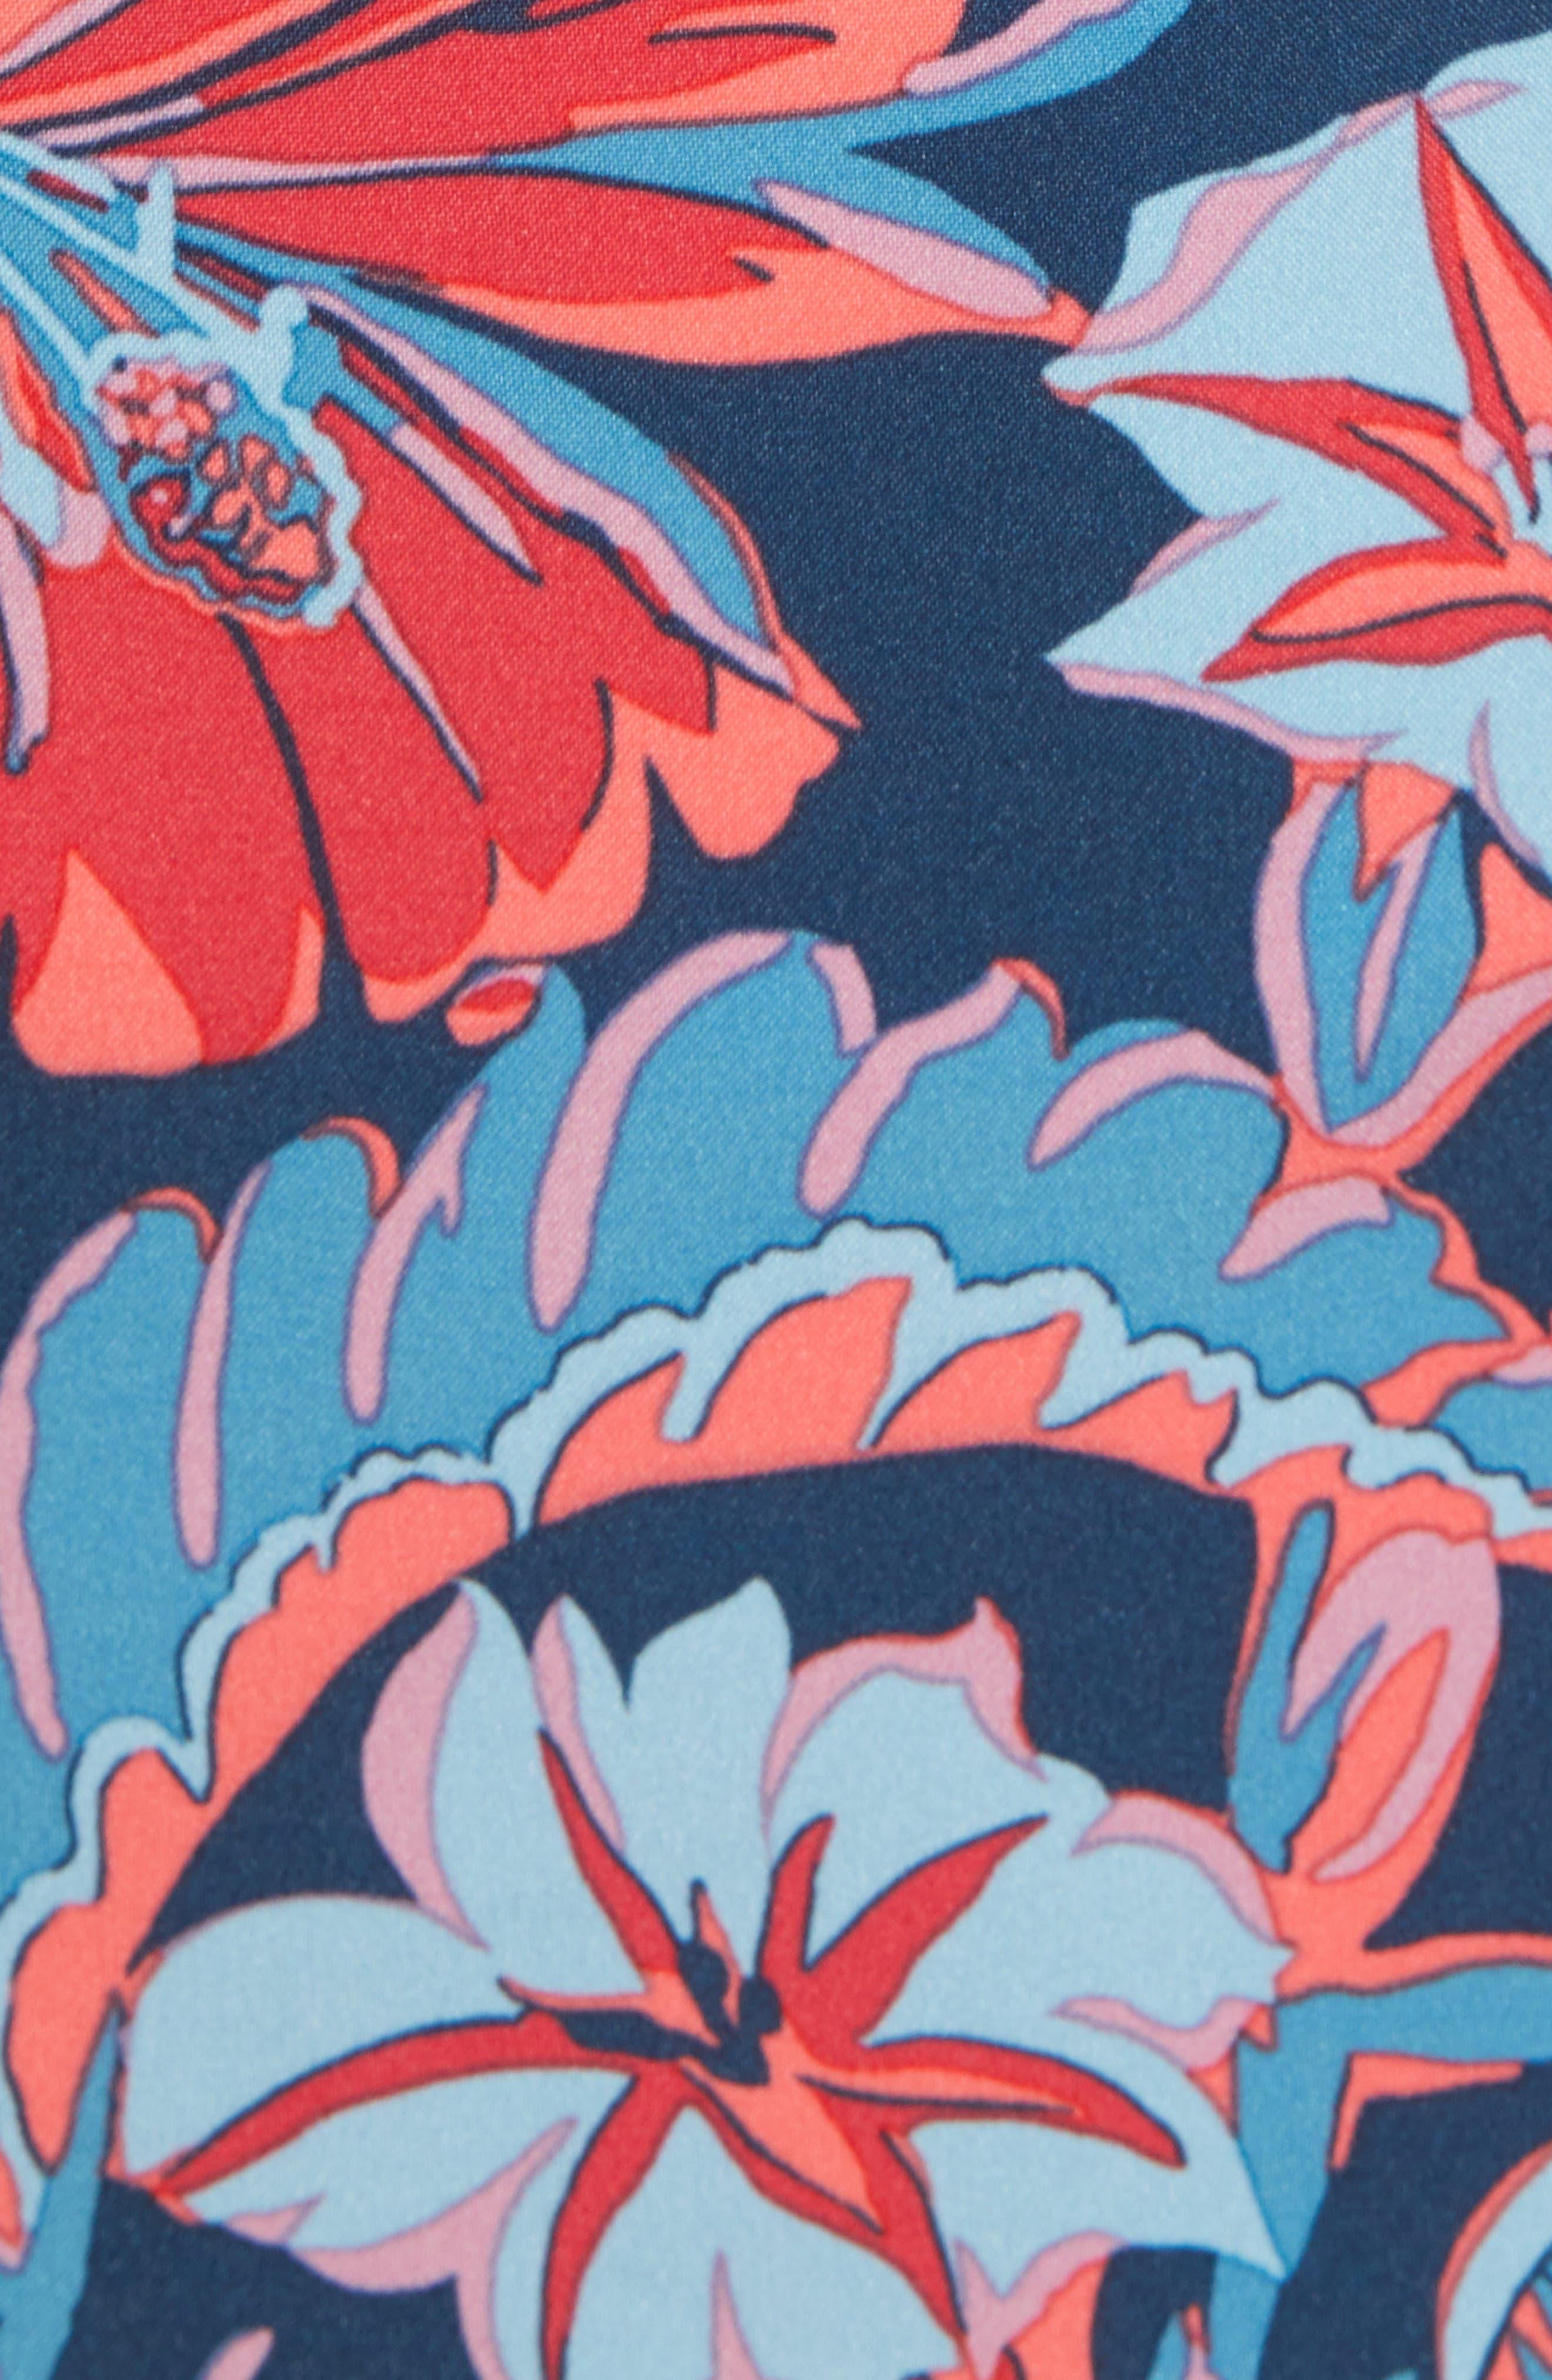 Banzai 9-Inch Swim Trunks,                             Alternate thumbnail 5, color,                             Pavillion Floral Print